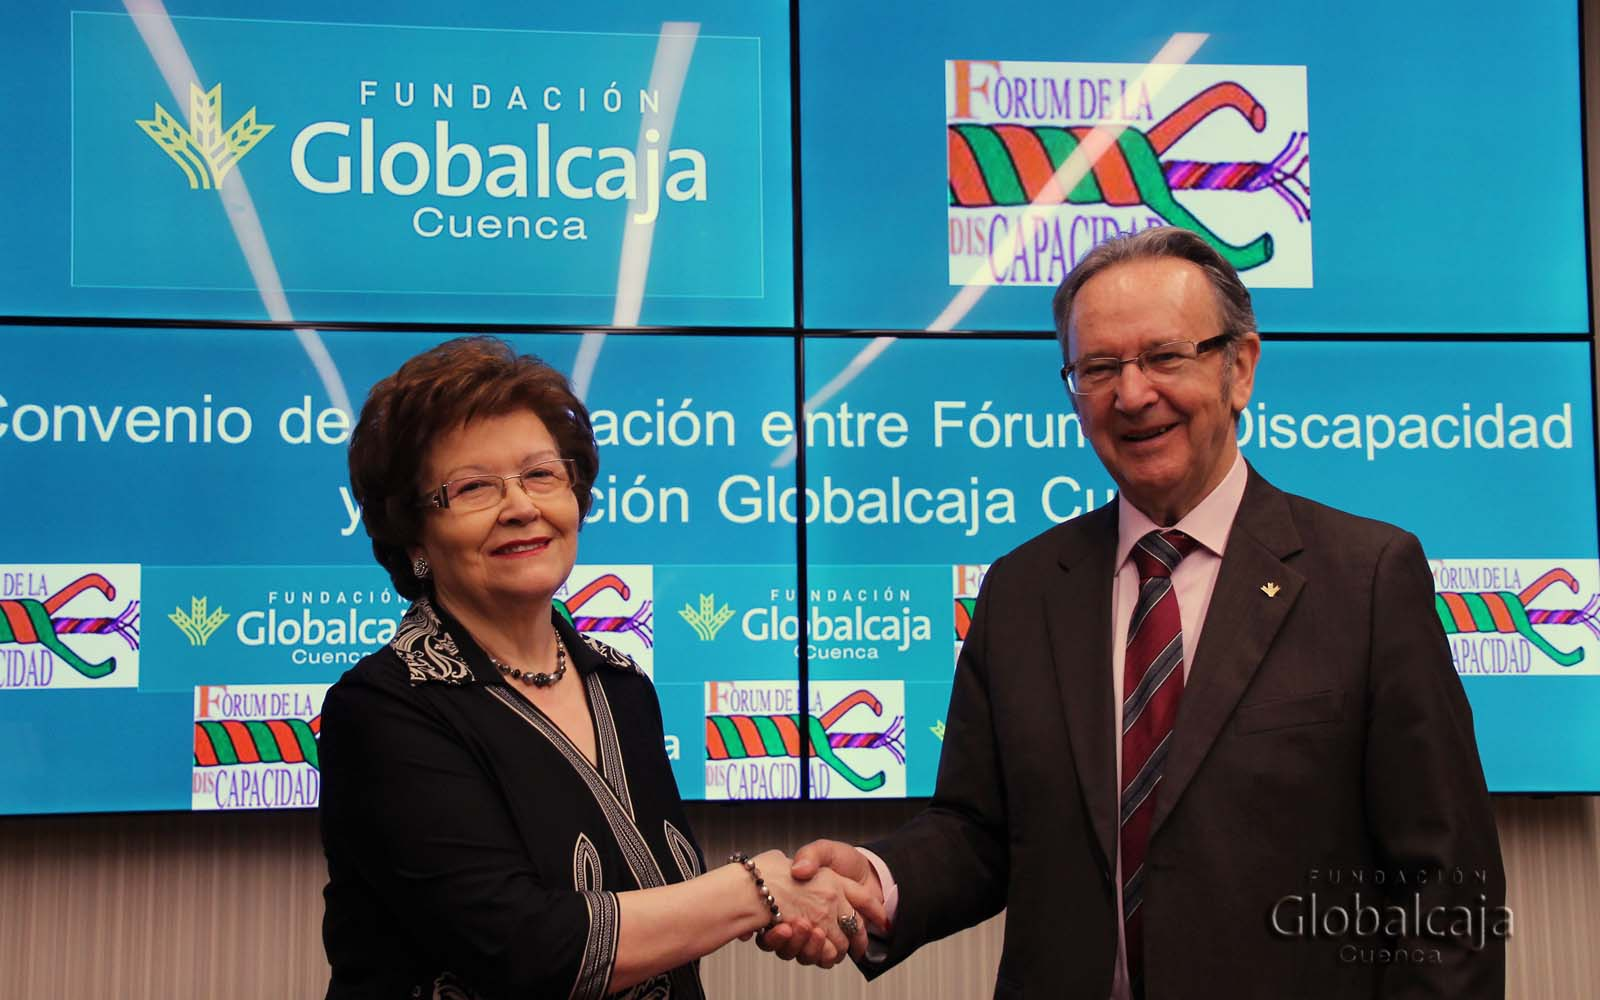 https://blog.globalcaja.es/wp-content/uploads/2016/04/FIRMA-CONVENIO_FORUM-DISCAPACIDAD-8_W.jpg